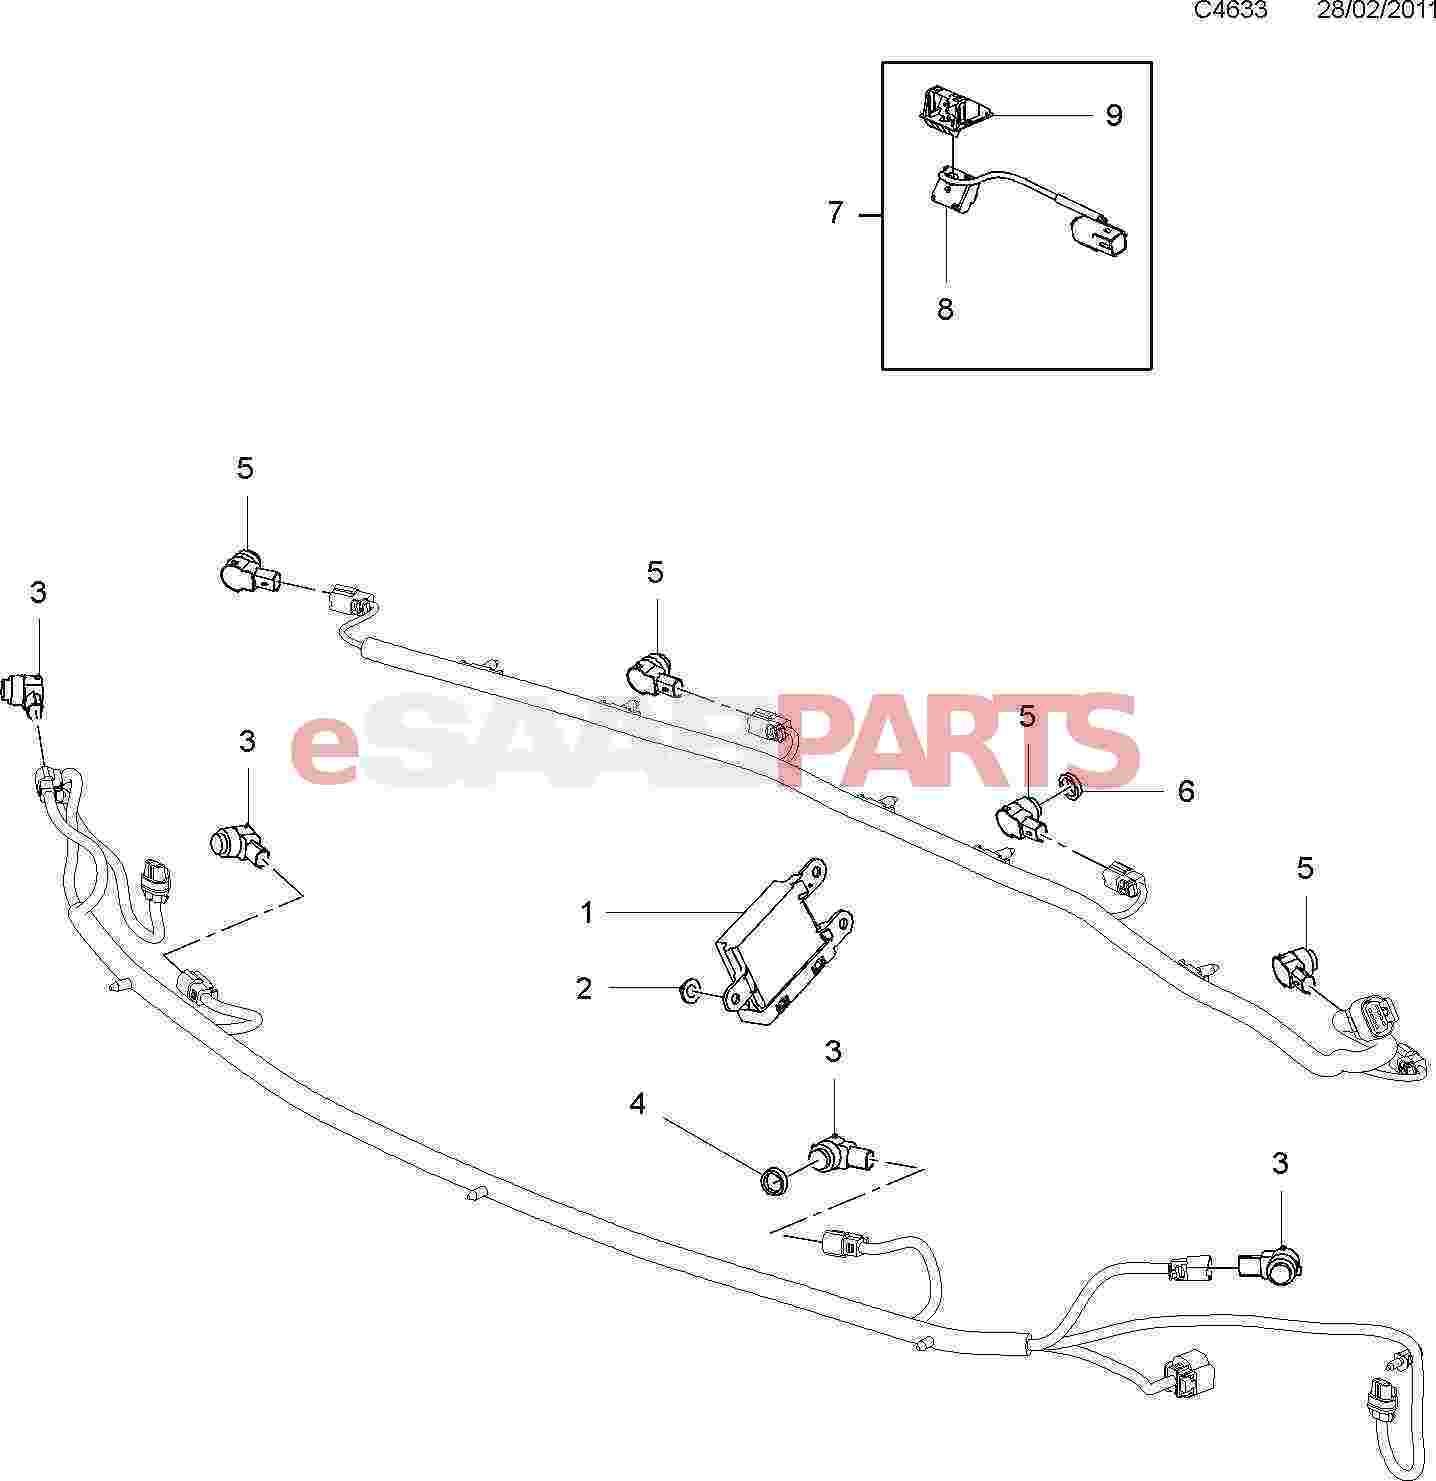 Saab Parking Sensor Wiring Diagram Library Esaabpartscom 9 4x 168 Electrical Parts